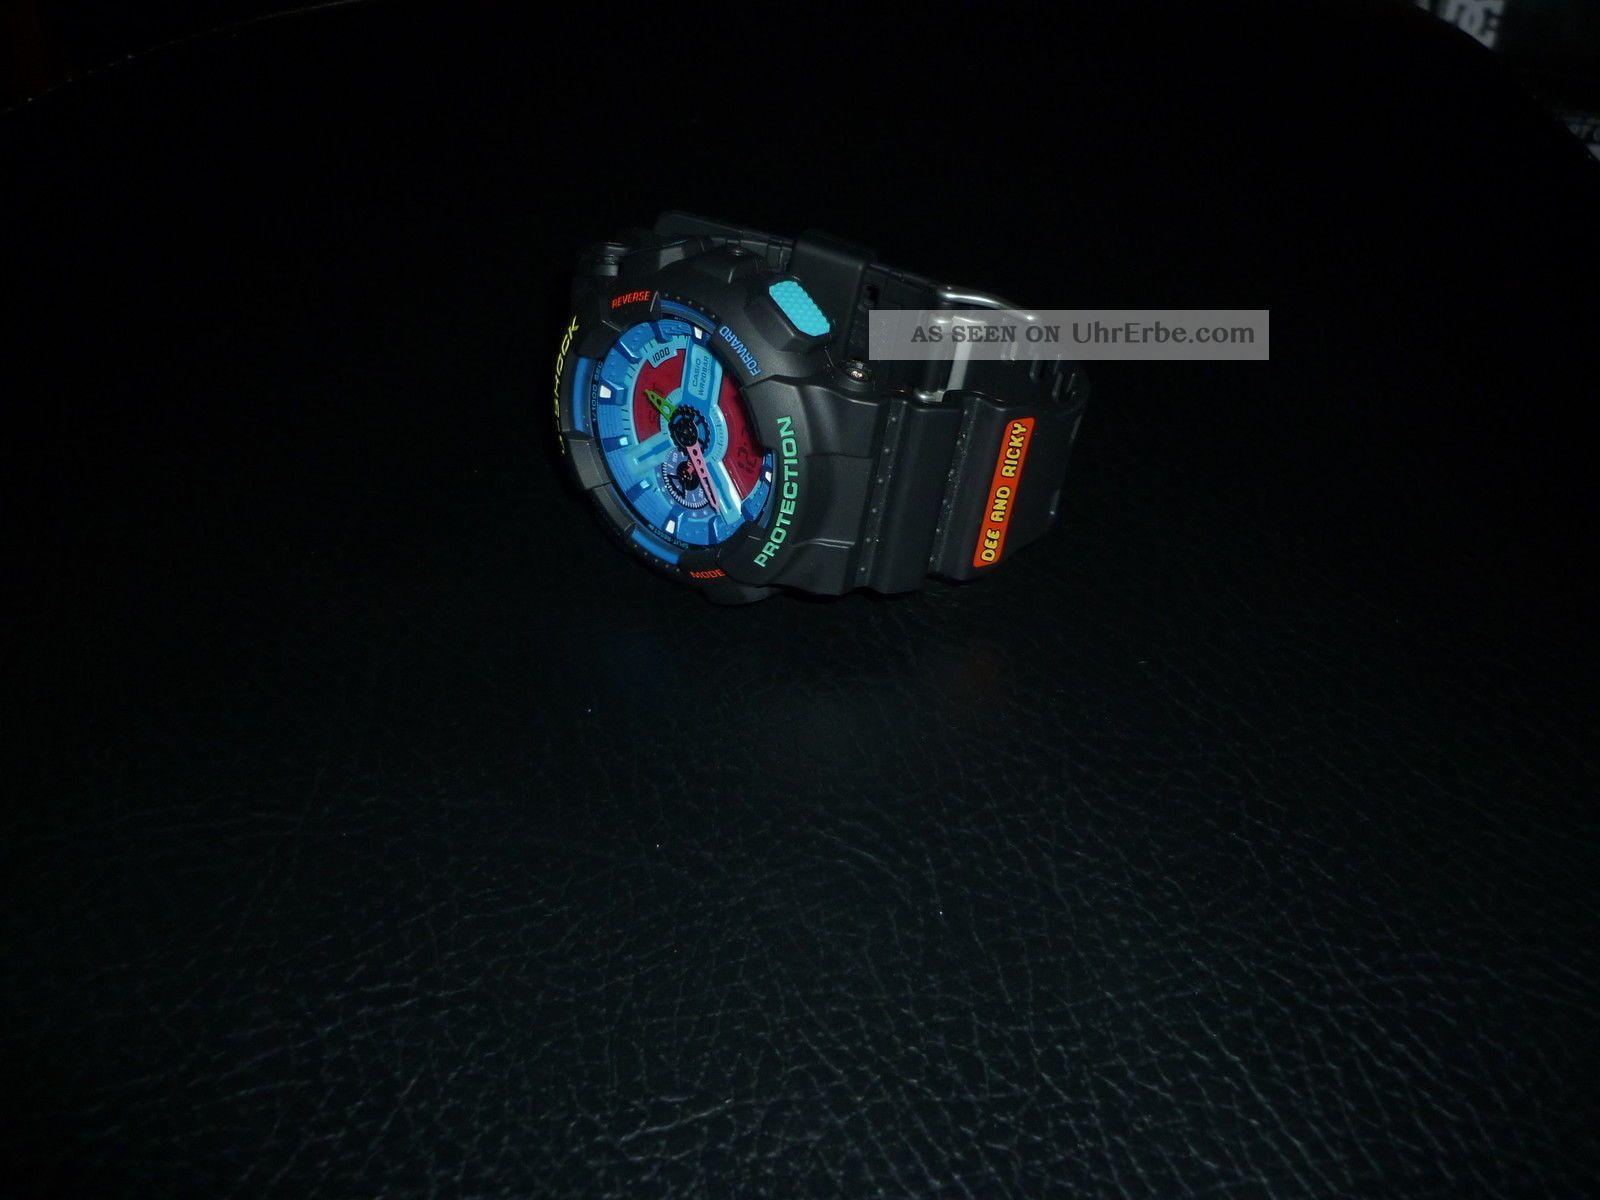 G - Shock Armbanduhren Bild